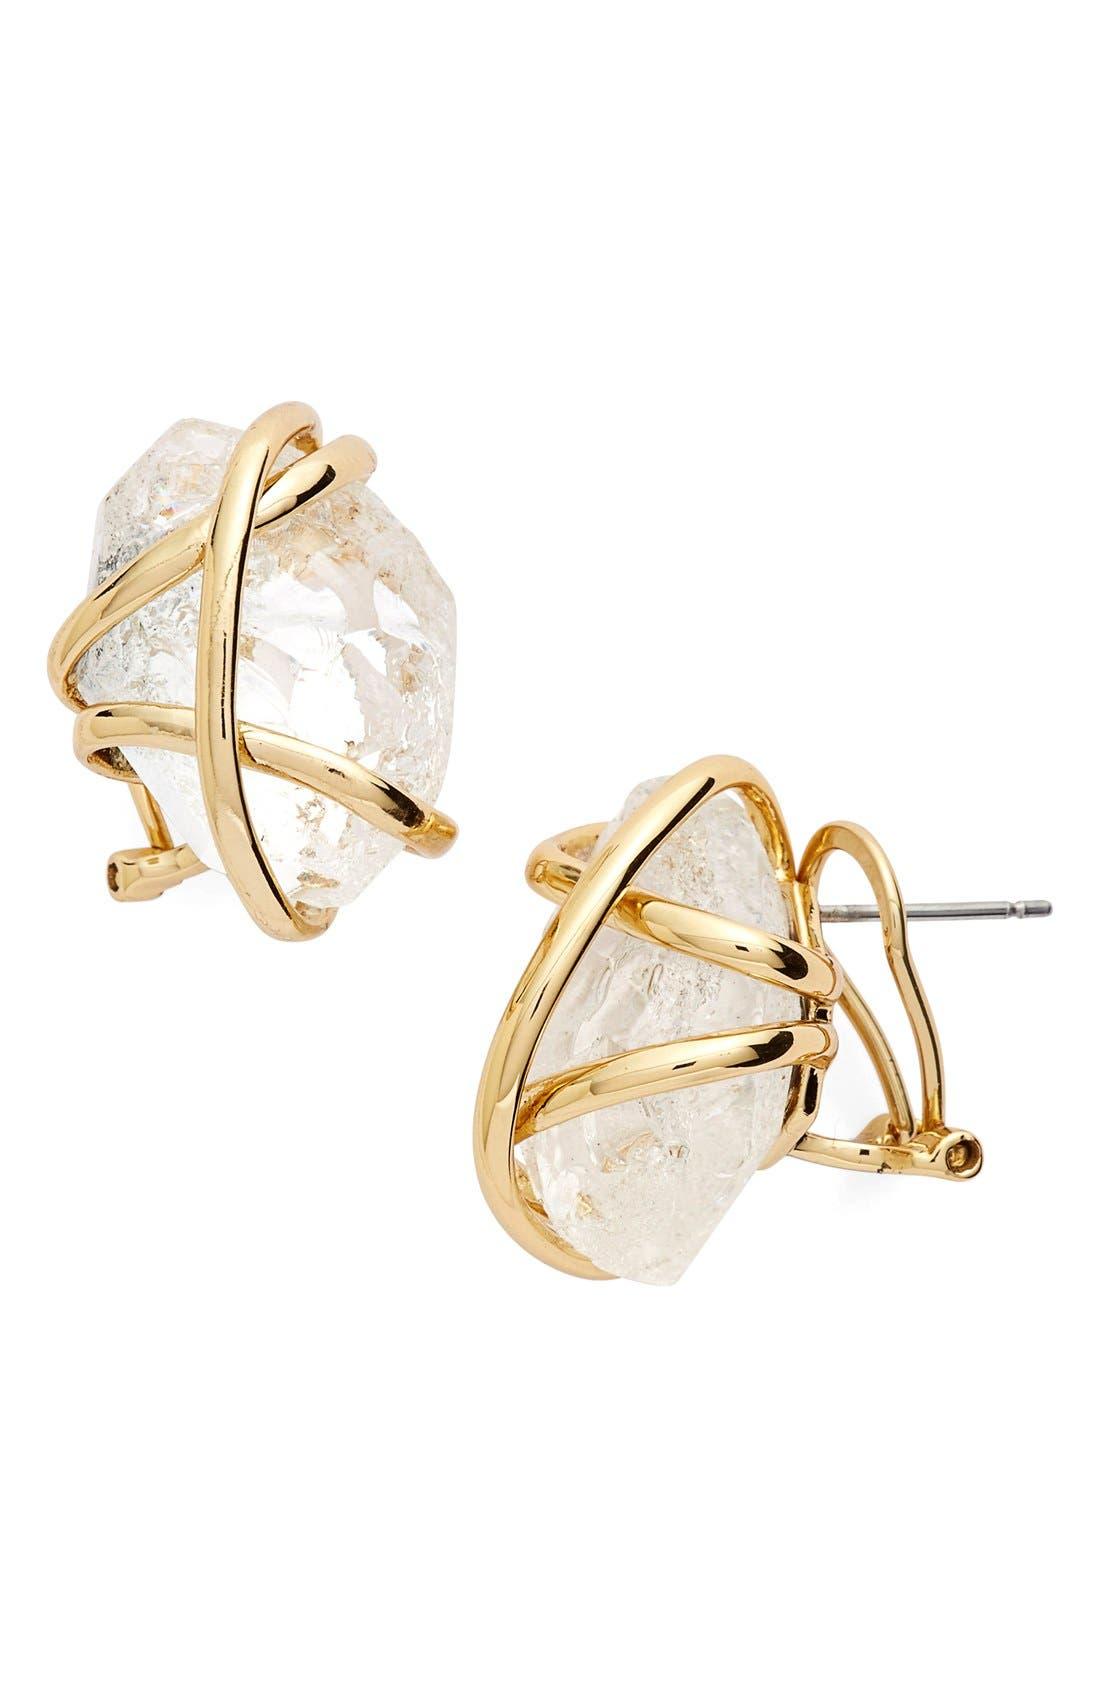 Main Image - Alexis Bittar 'Miss Havisham' Rough Cut Crystal Stud Earrings